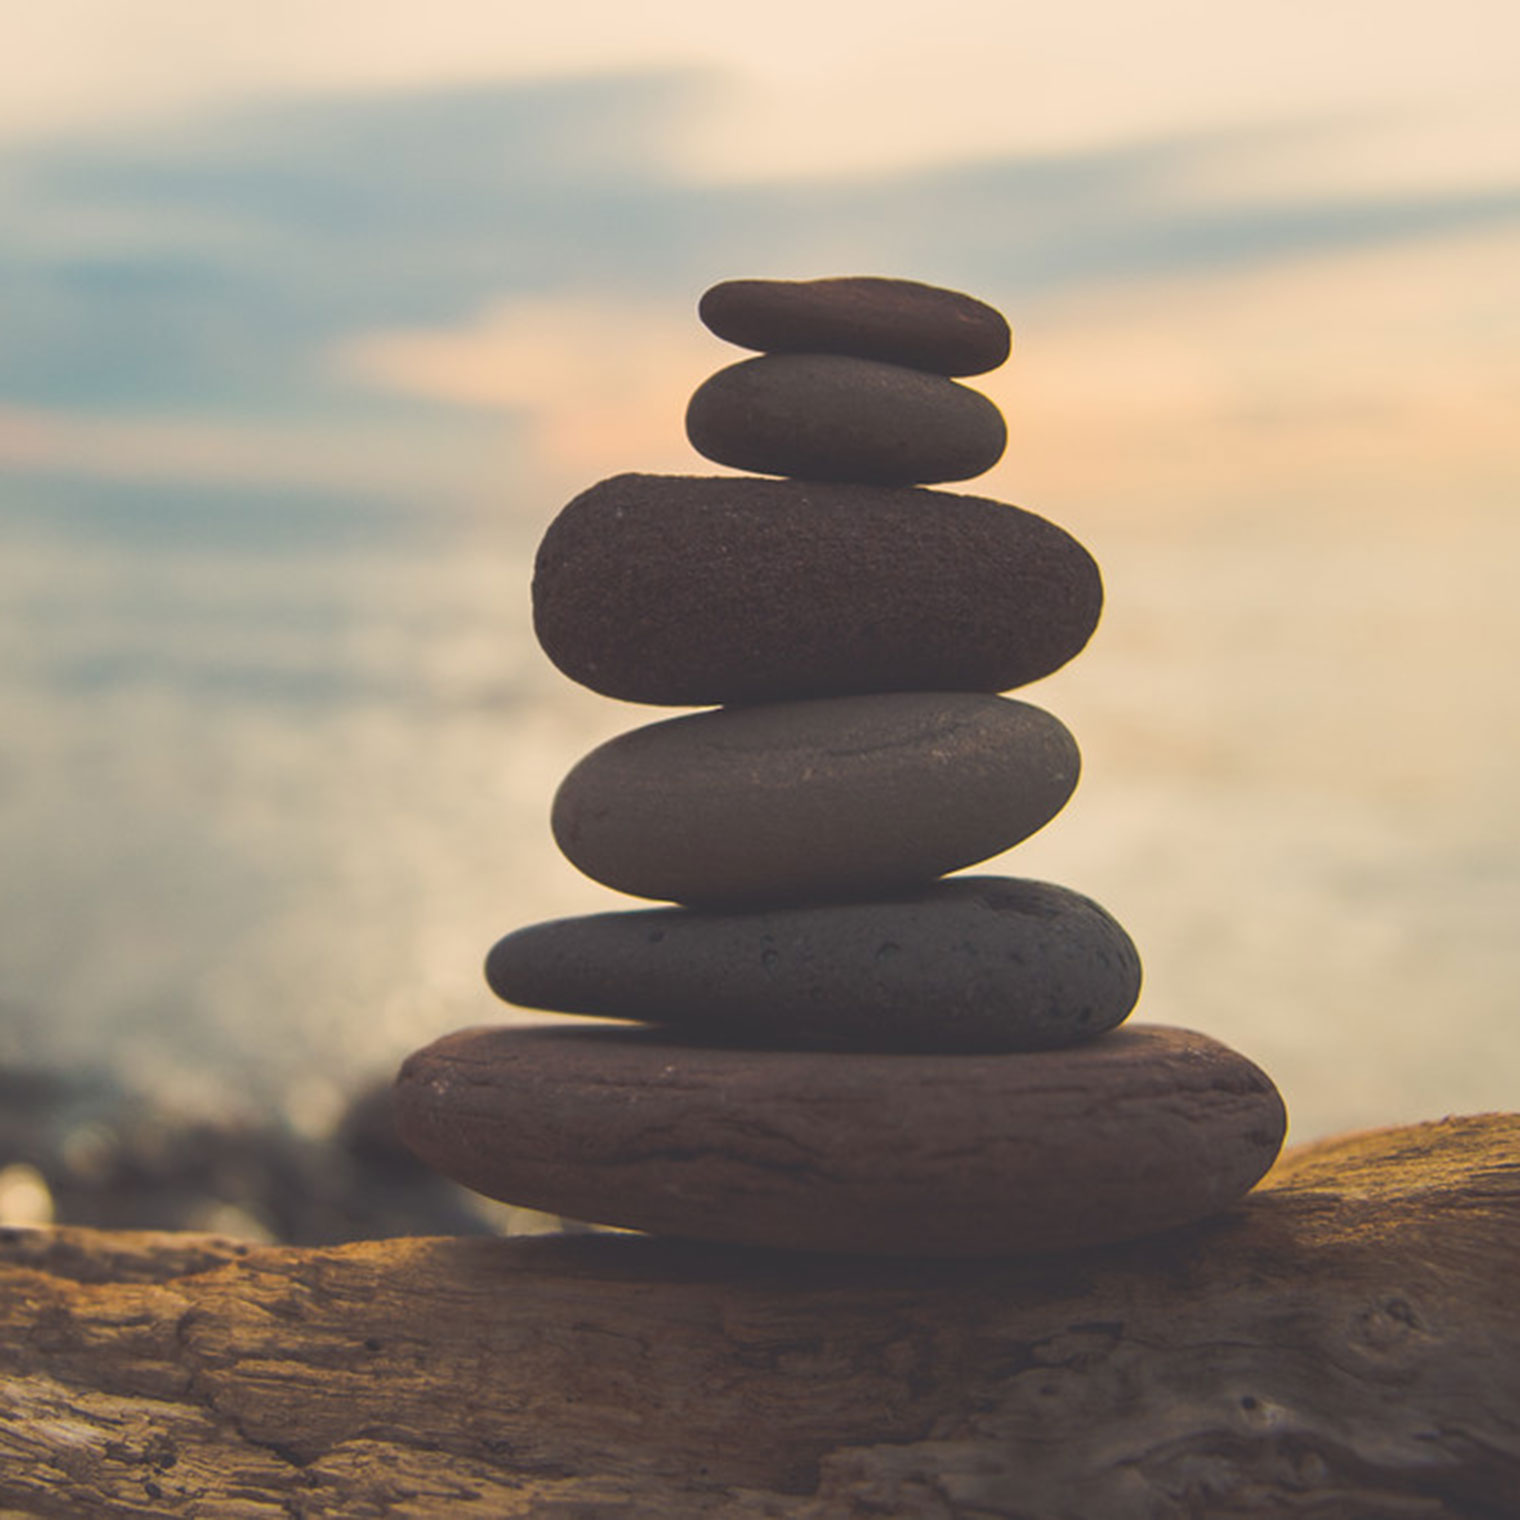 yoga balancing stones mount bohemia